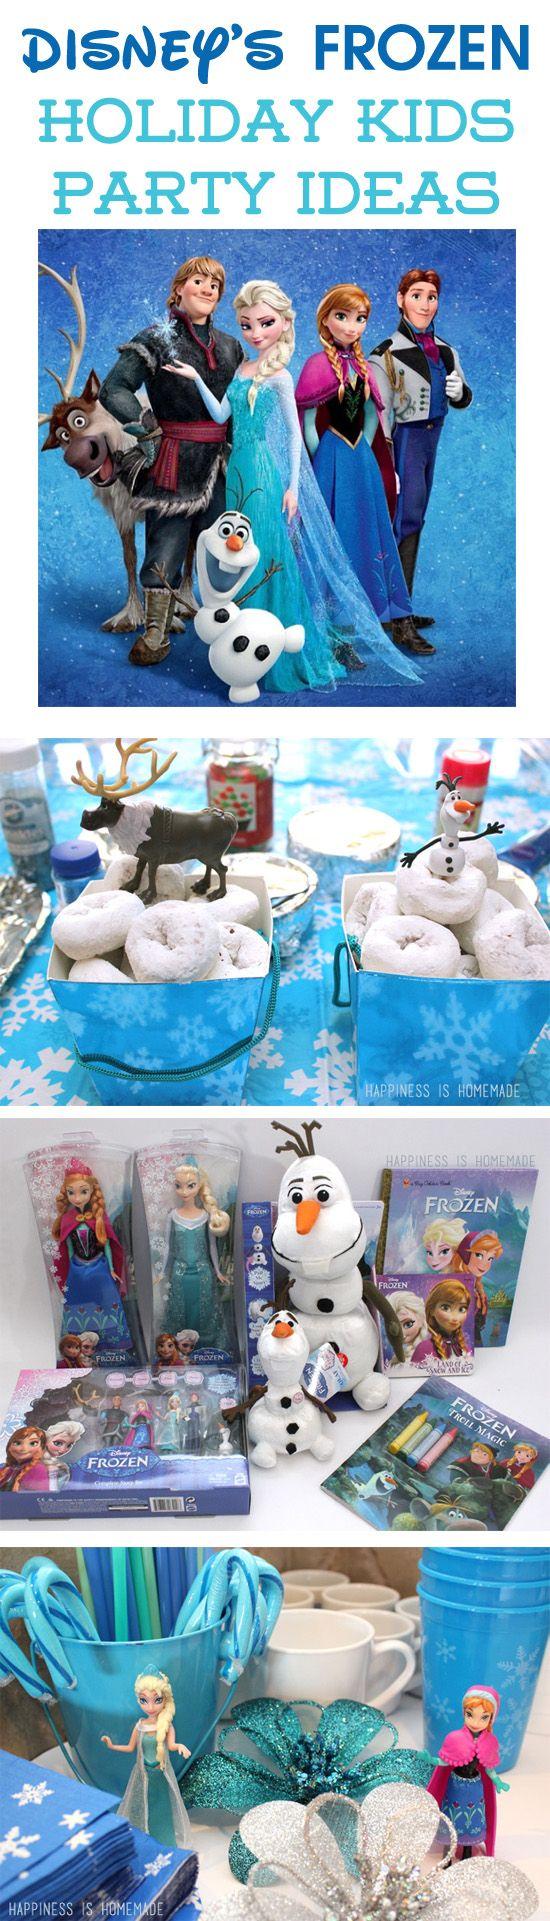 frozen disney party ideas   Disneys-FROZEN-Movie-Party-Ideas-FrozenFun-cbias-shop.jpg